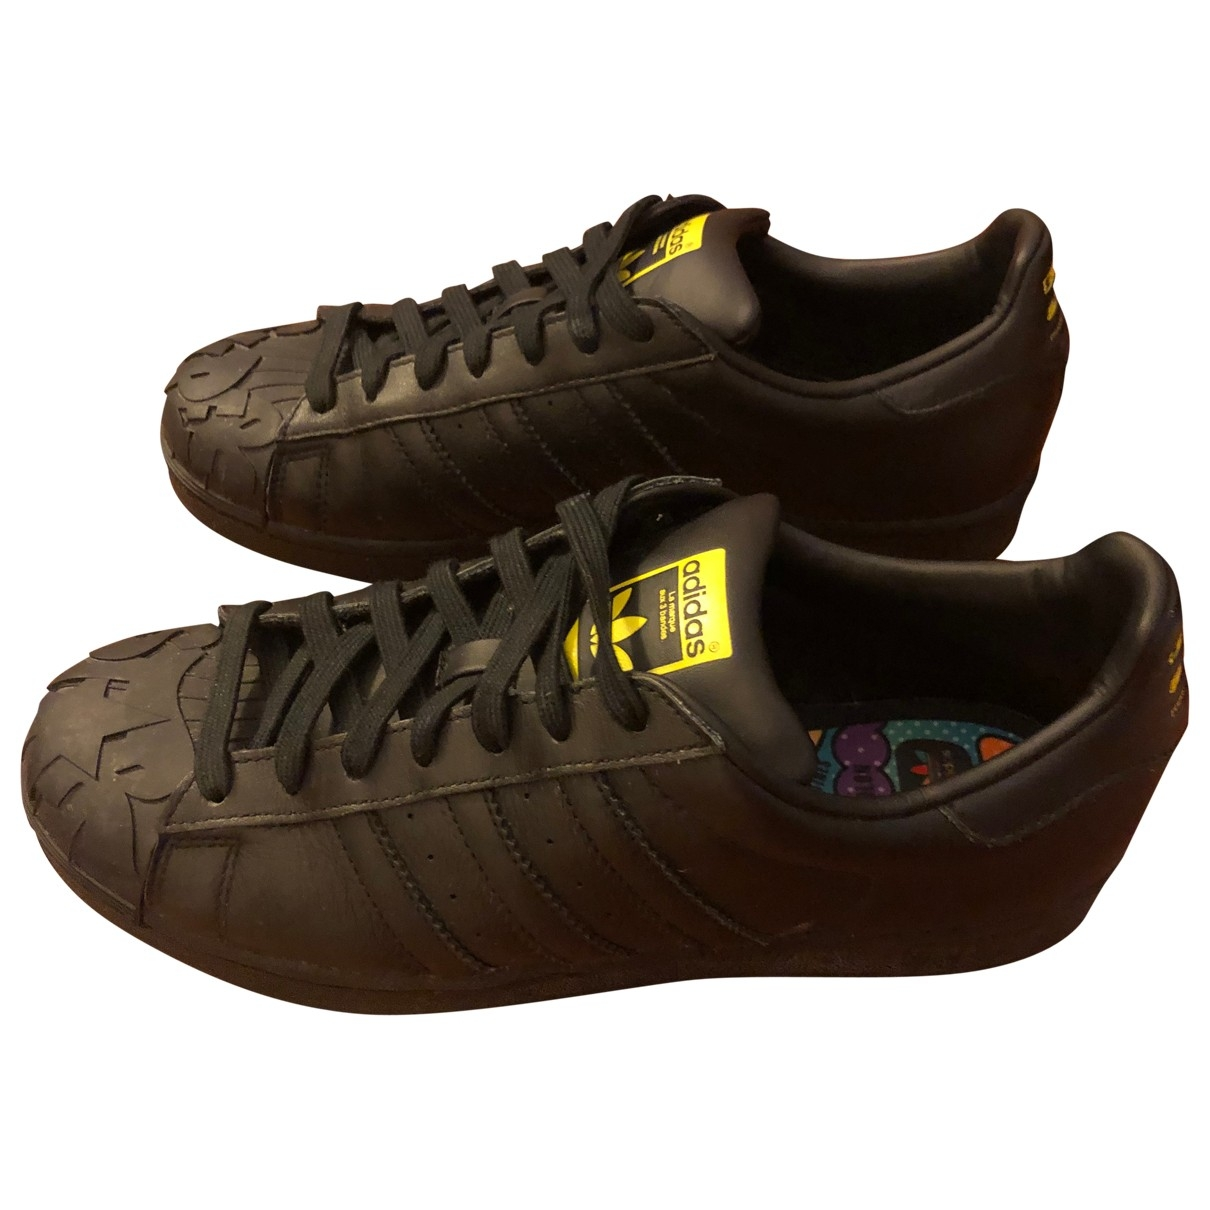 Deportivas de Cuero Adidas X Pharrell Williams